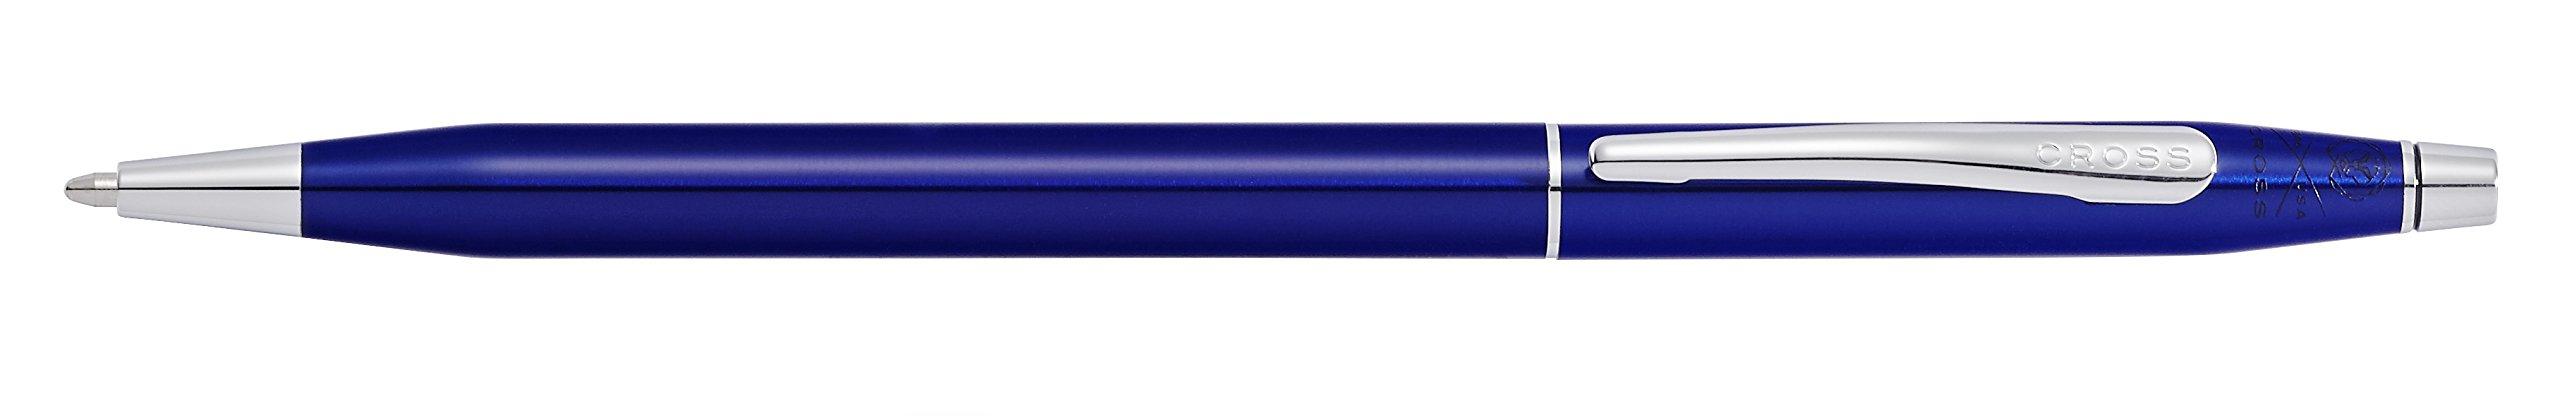 Cross Classic Century Translucent Blue Lacquer Ballpoint Pen